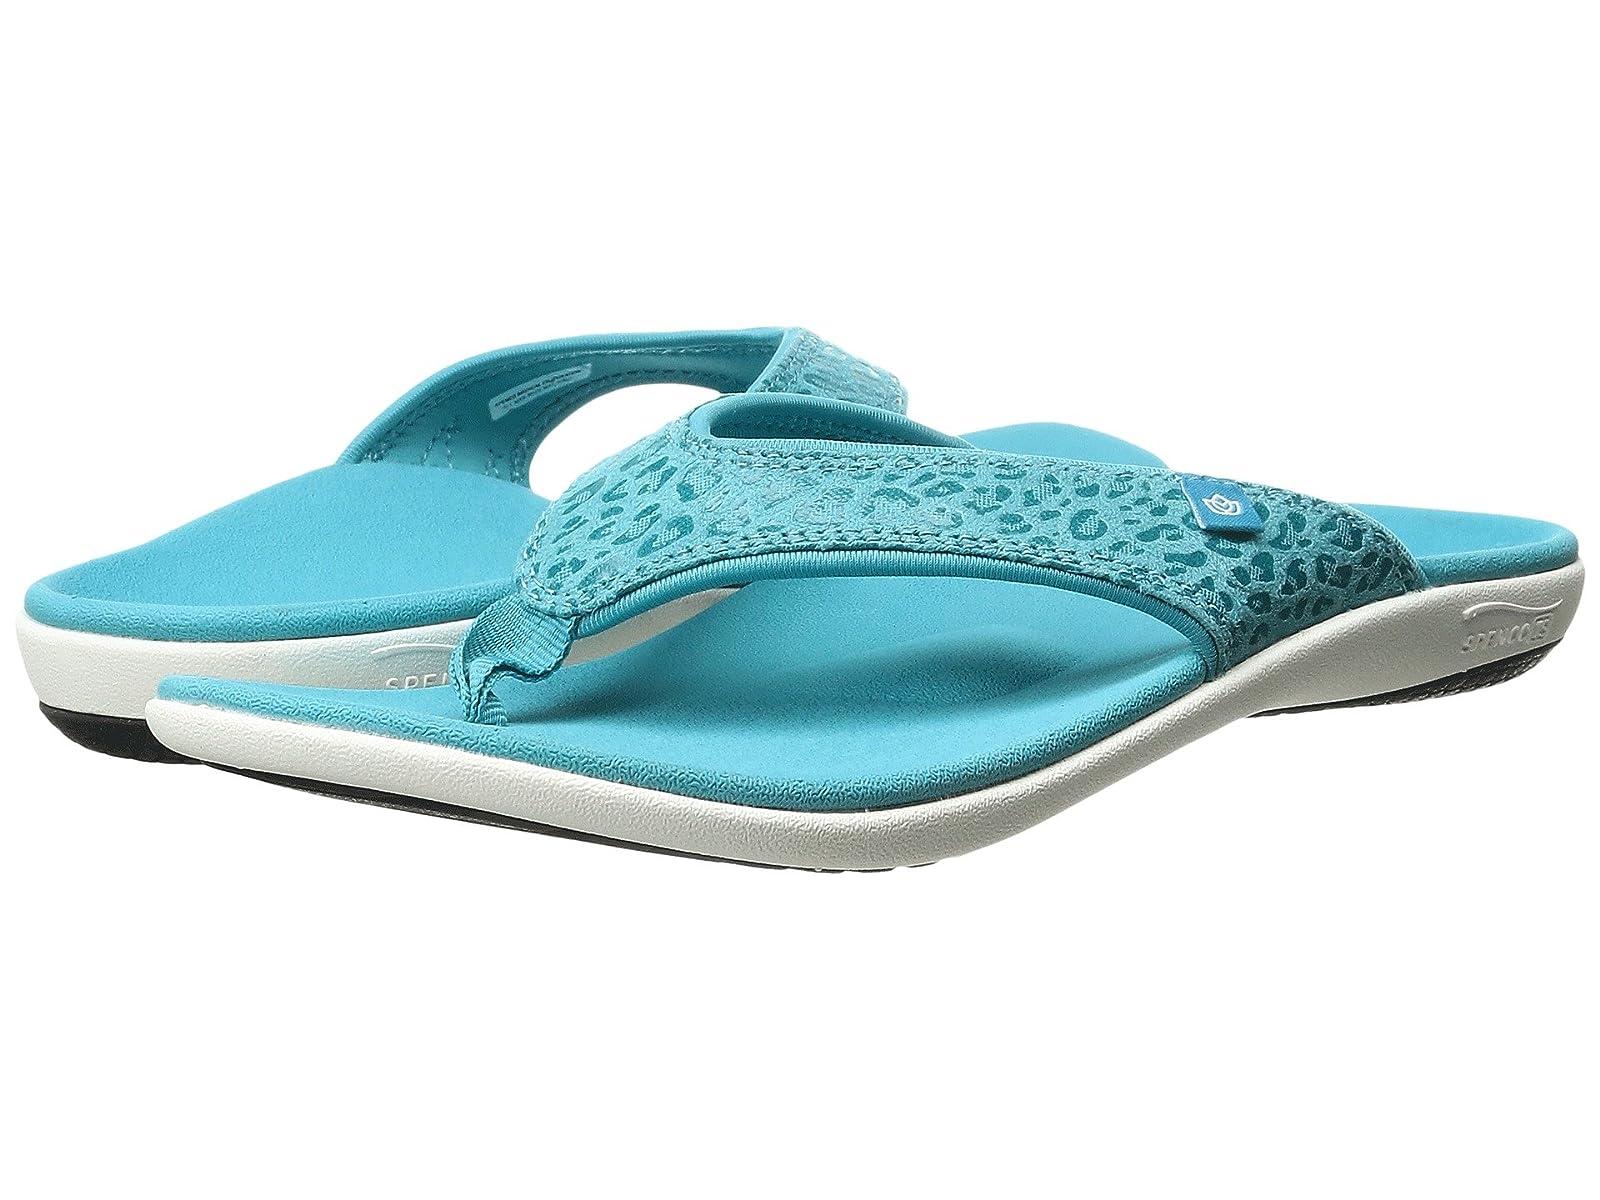 Spenco Cheetah PrintAtmospheric grades have affordable shoes